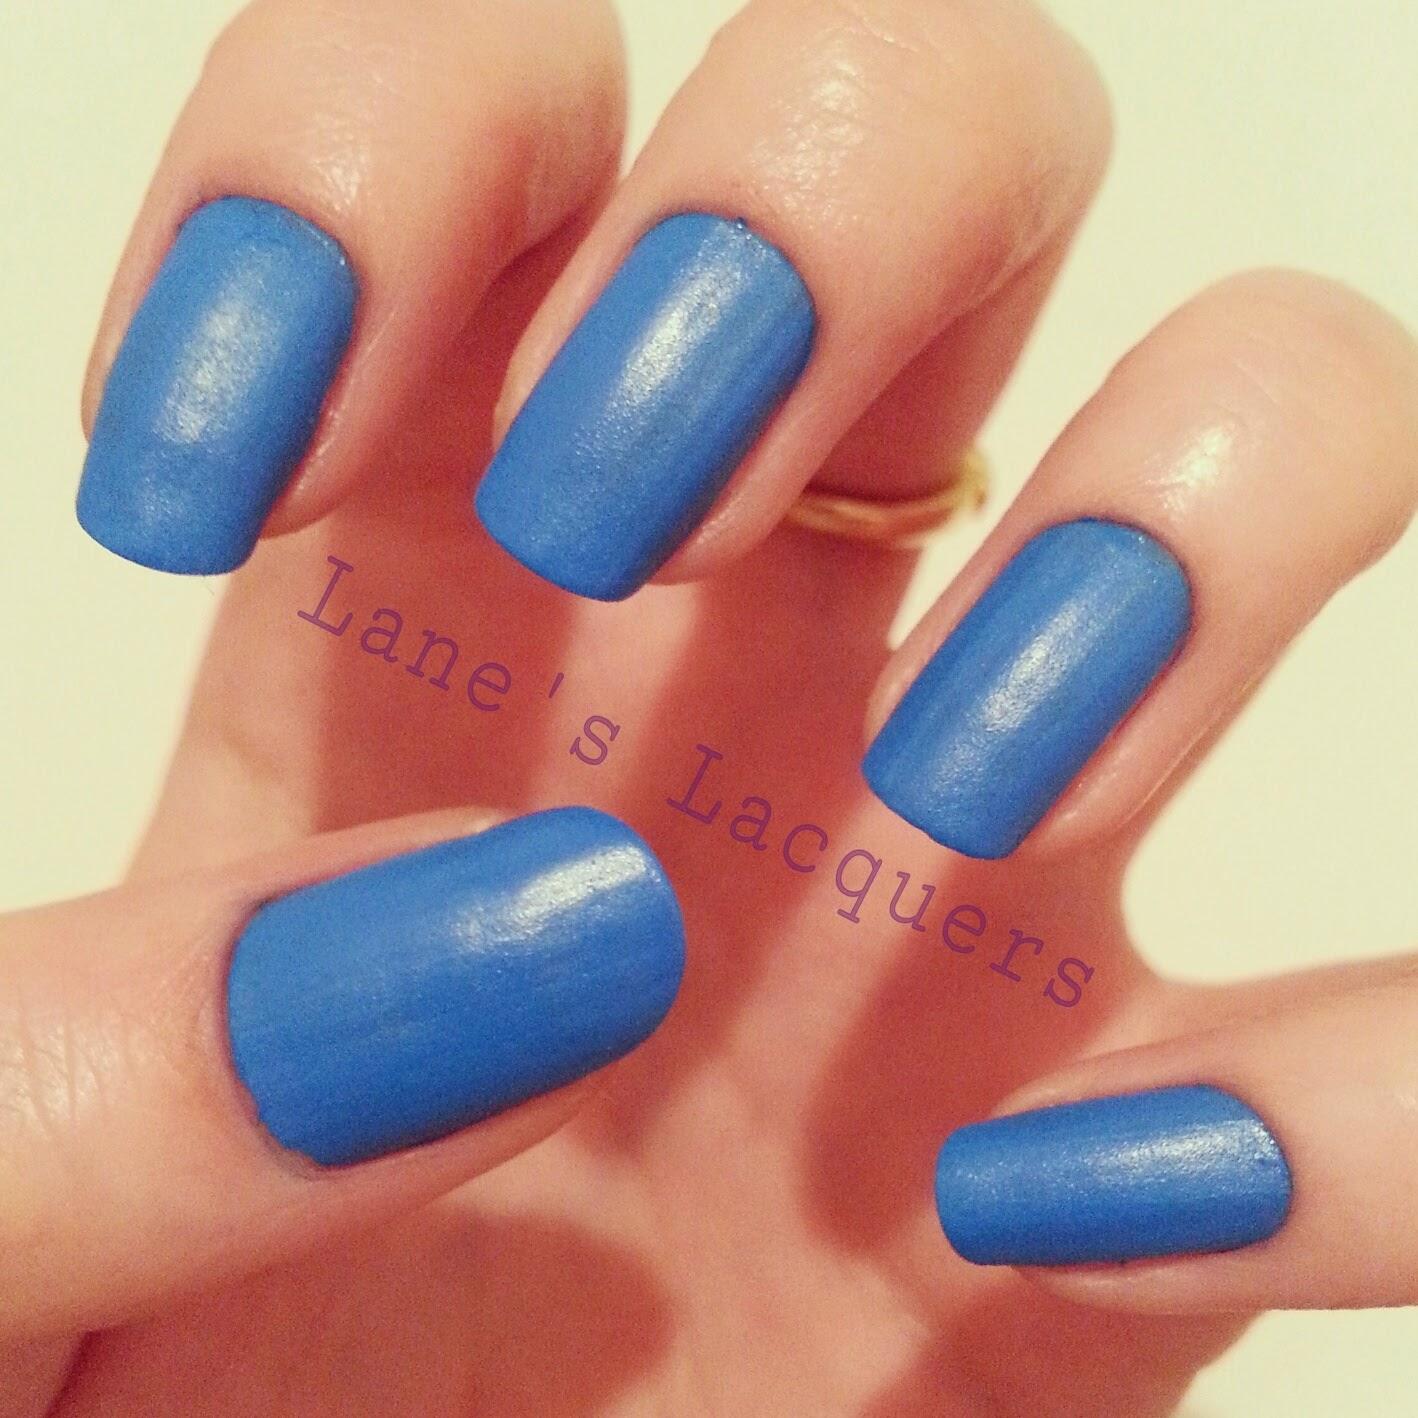 barry-m-malibu-swatch-manicure (1)